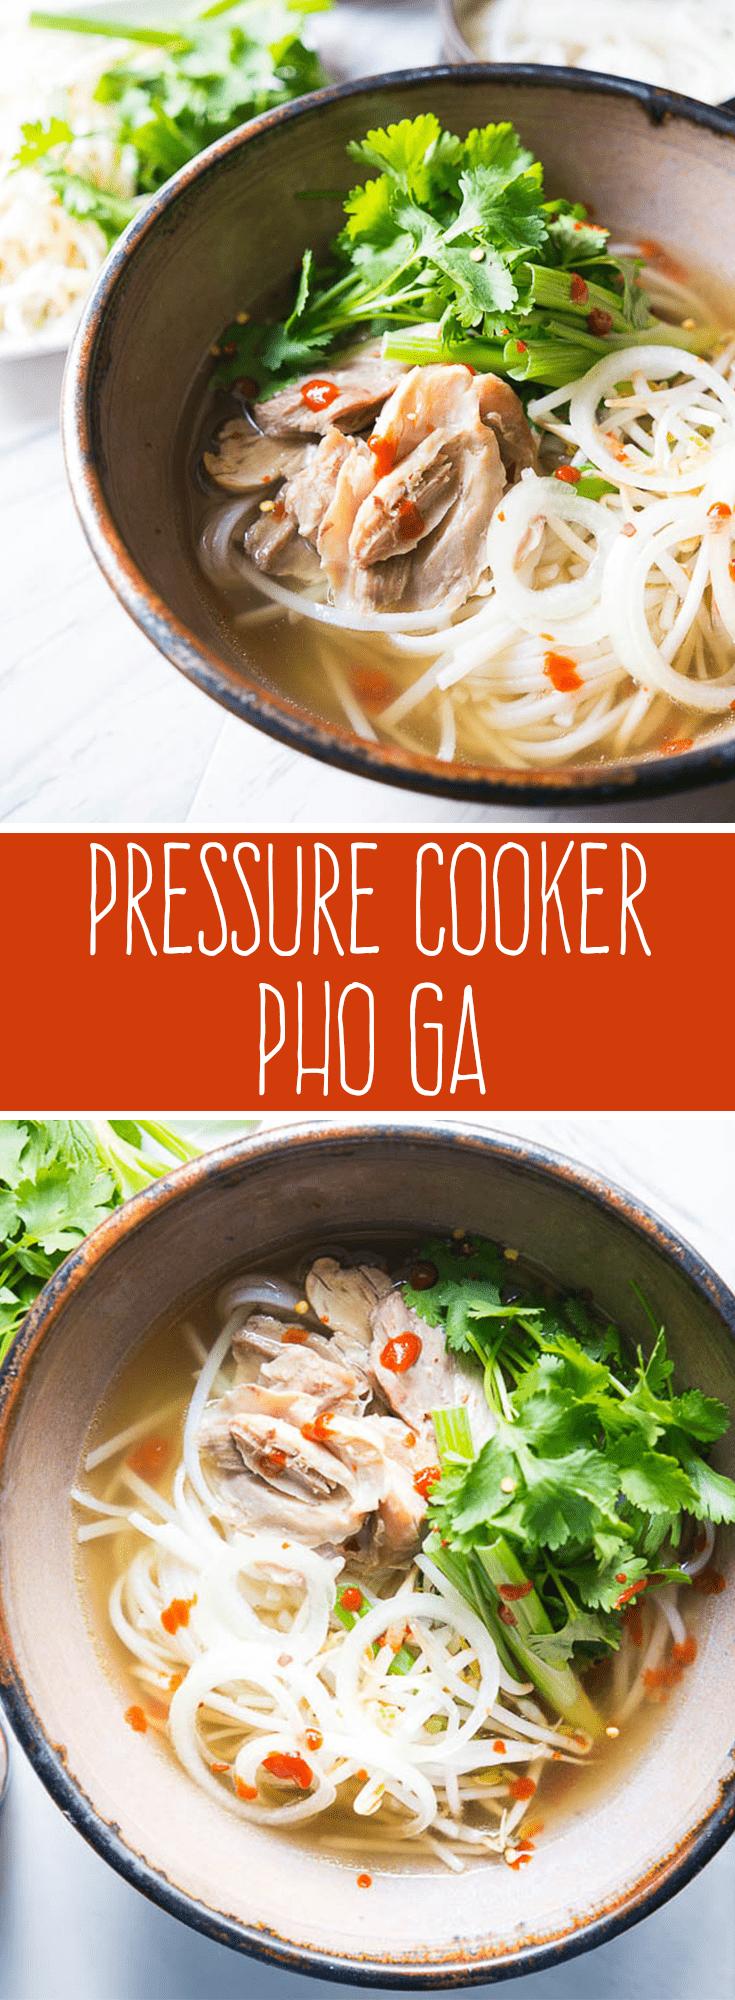 Pressure Cooker Pho Ga photo collage